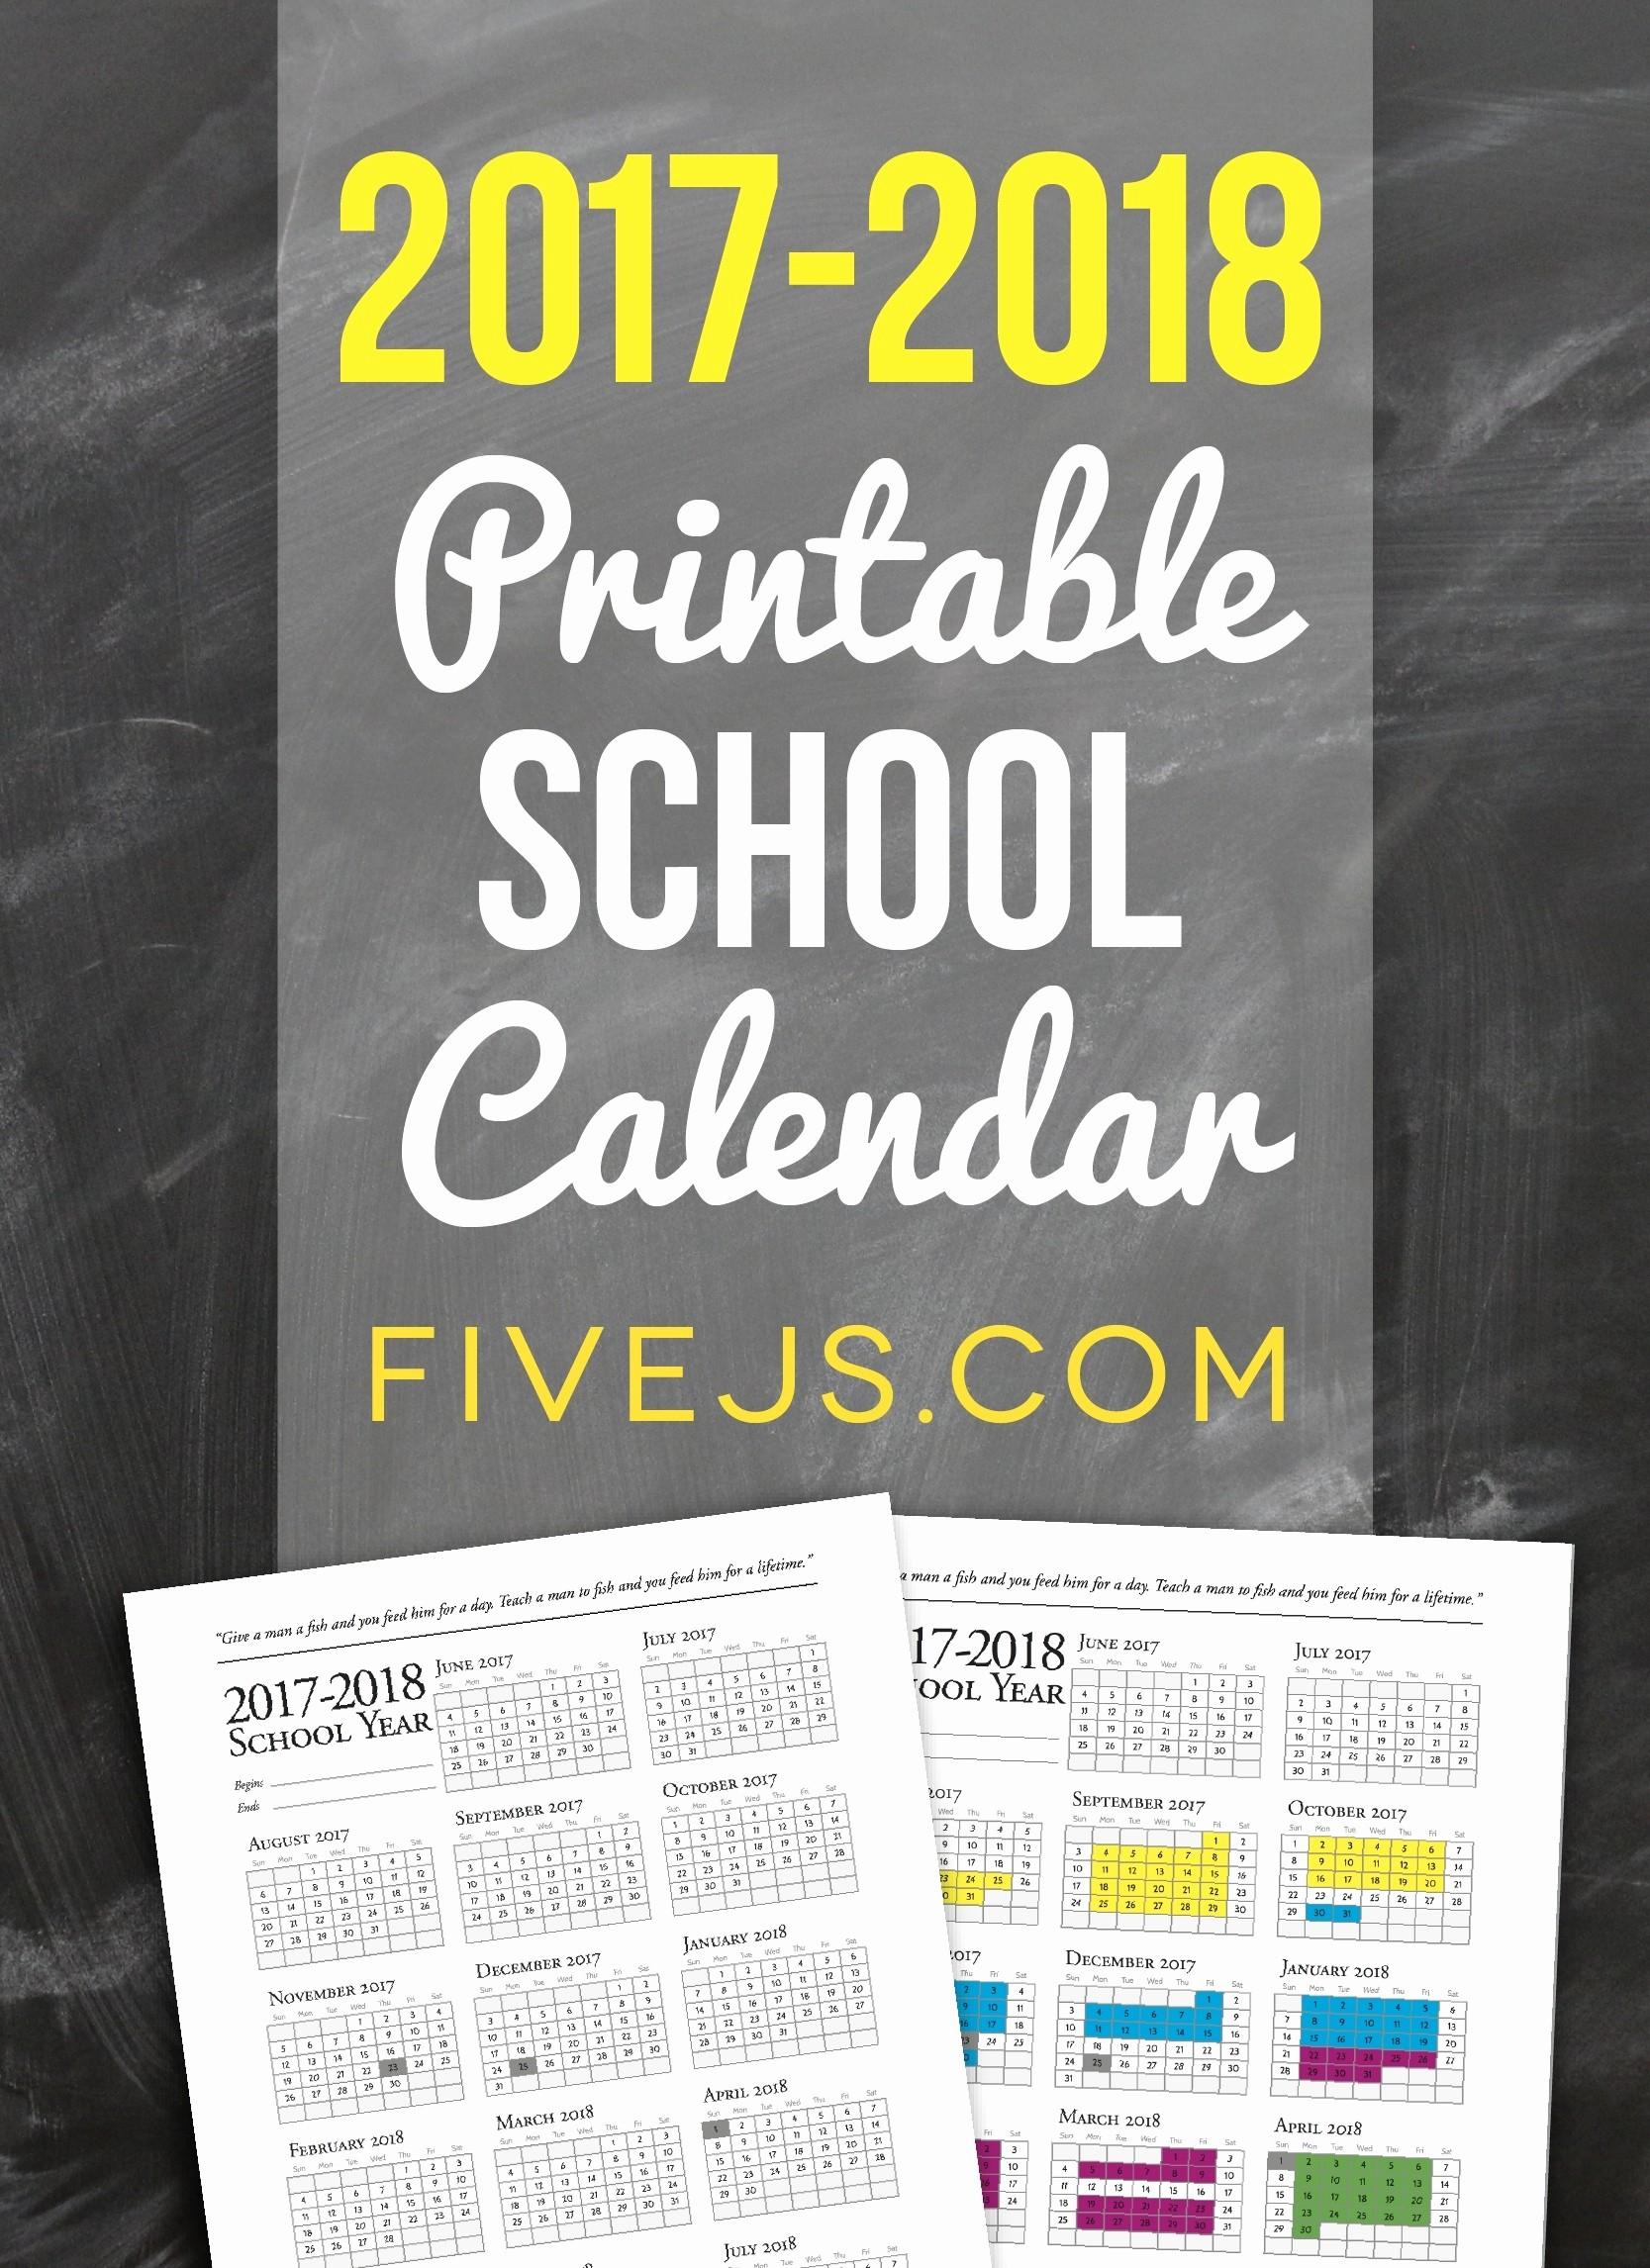 2017-2018 Blank Calendar Beautiful Free Printable School Calendar for 2017 2018 Five J S